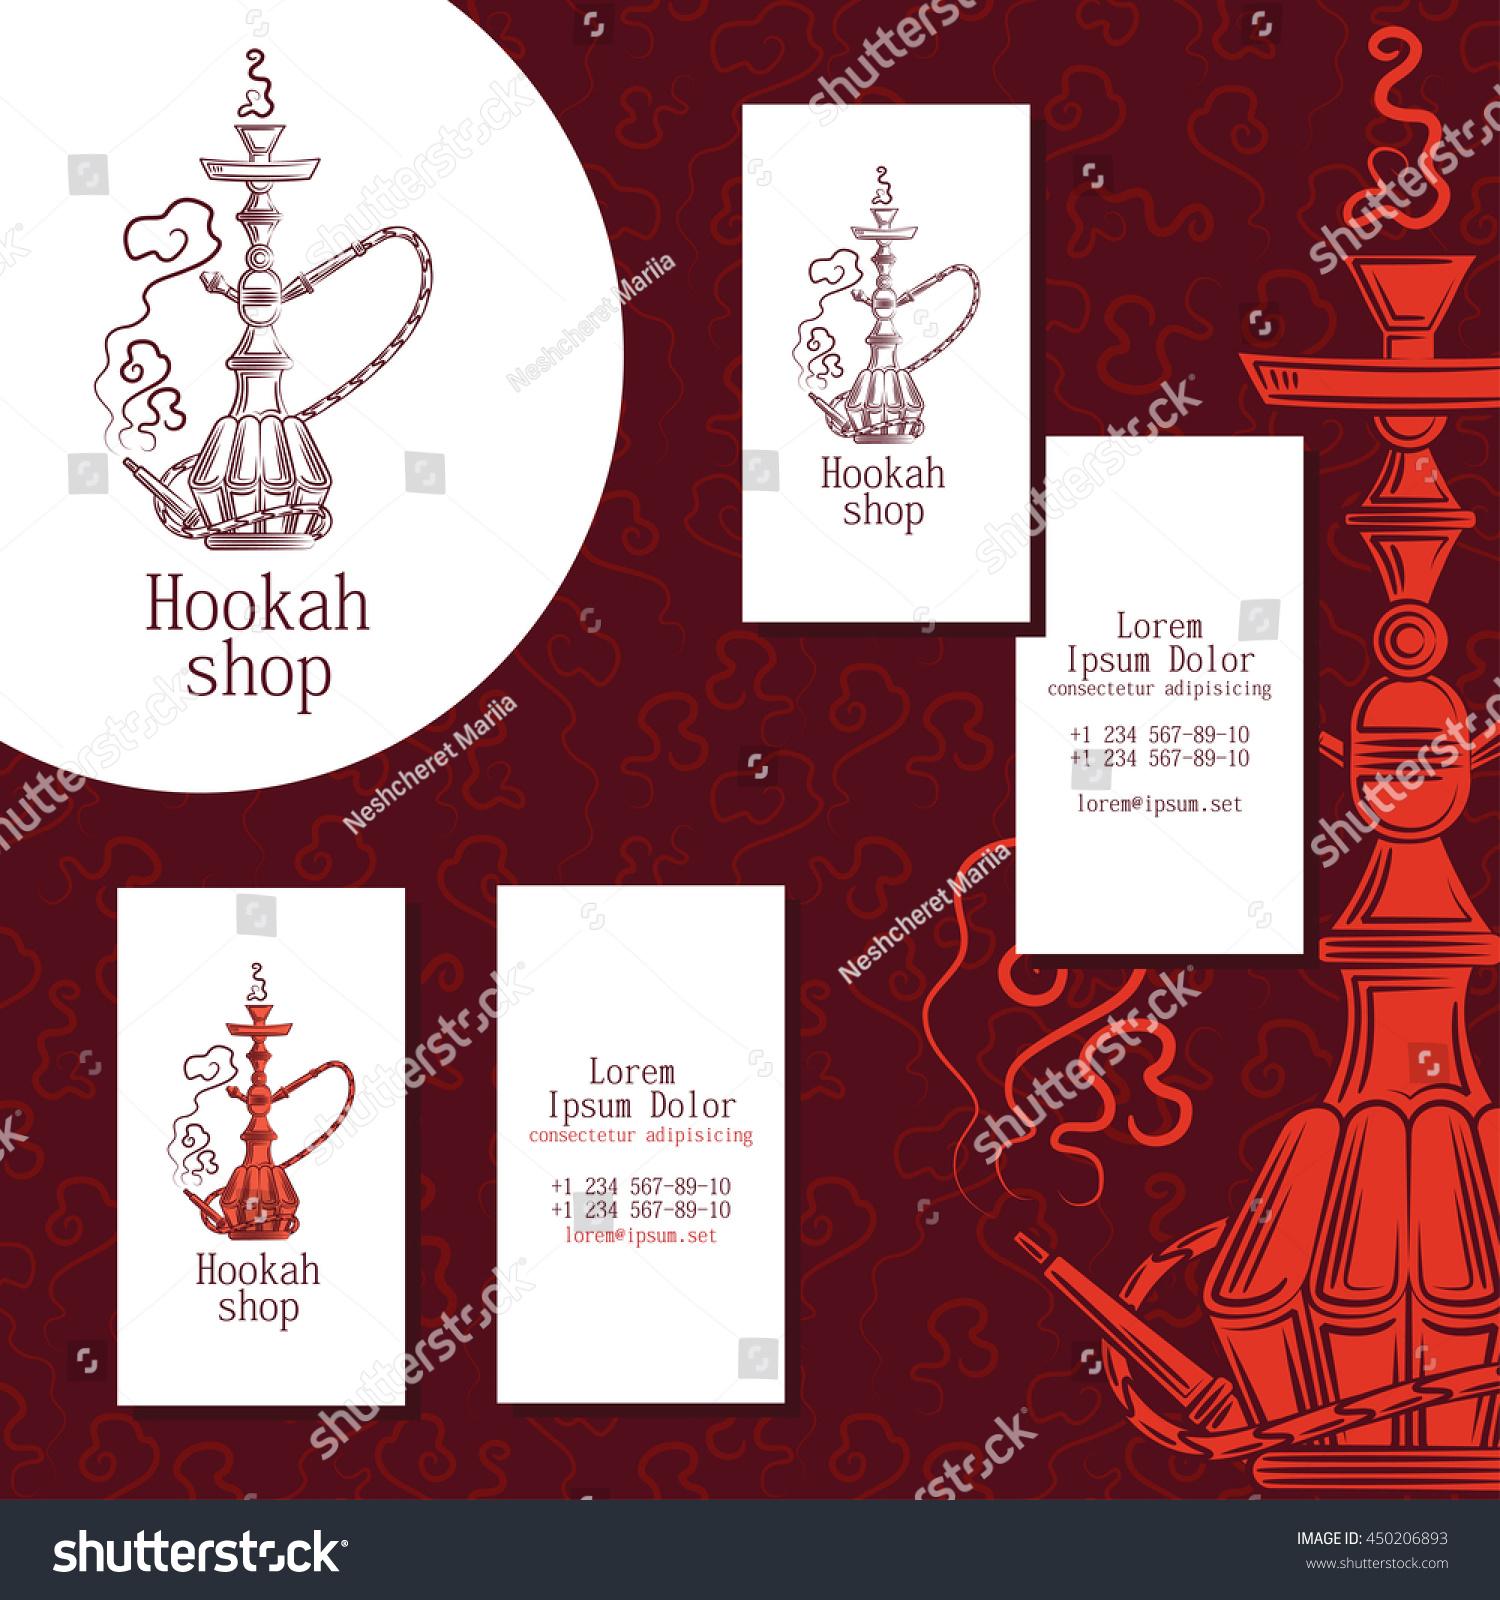 Logo hookah shop set business cards stock vector 450206893 logo for hookah shop set of business cards for hookah shop magicingreecefo Choice Image